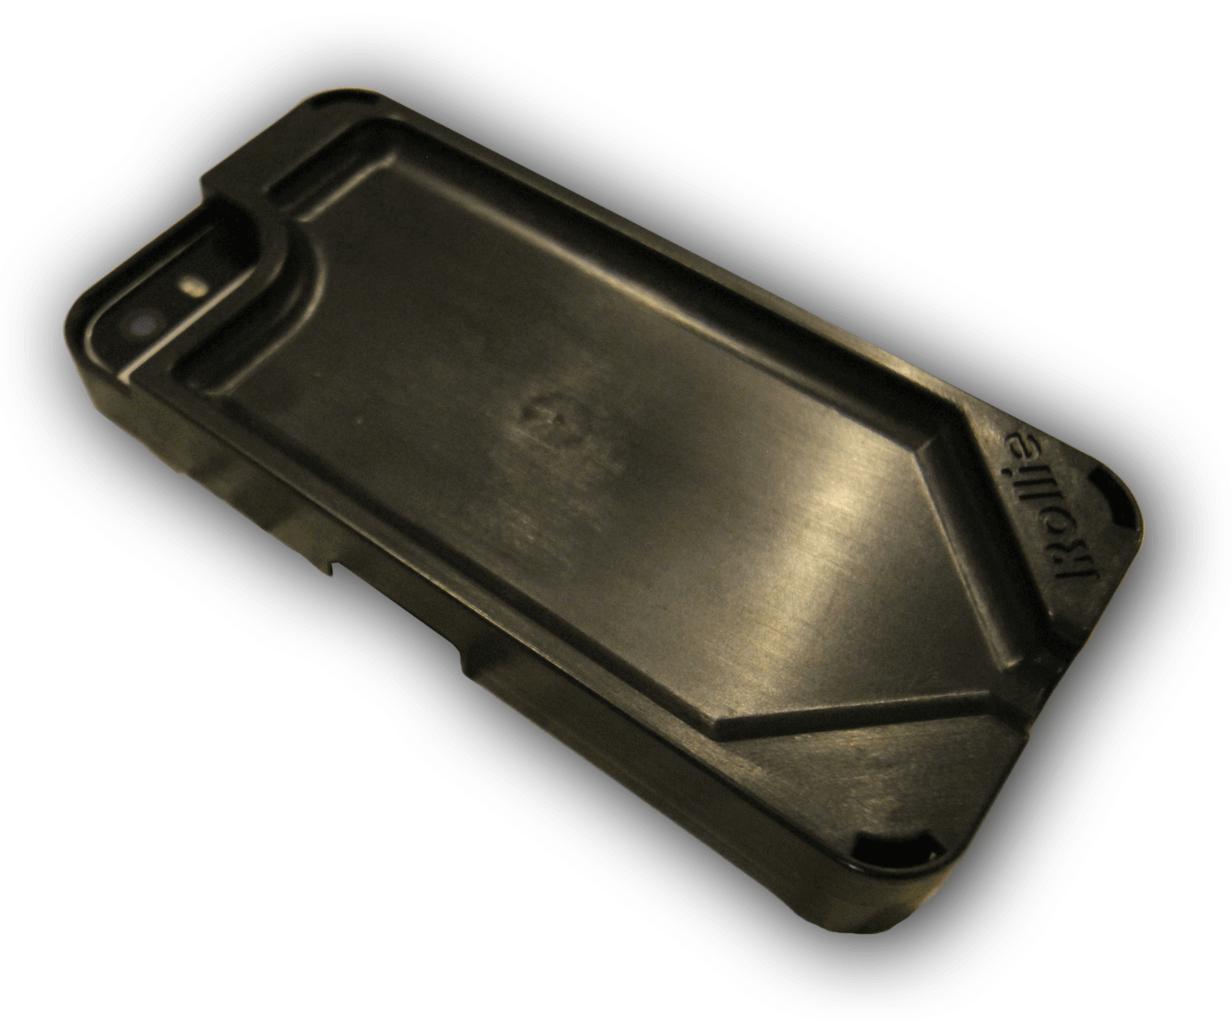 quality design 82954 82a0e iRollie Phone Case Review - Mary Jane's Diary